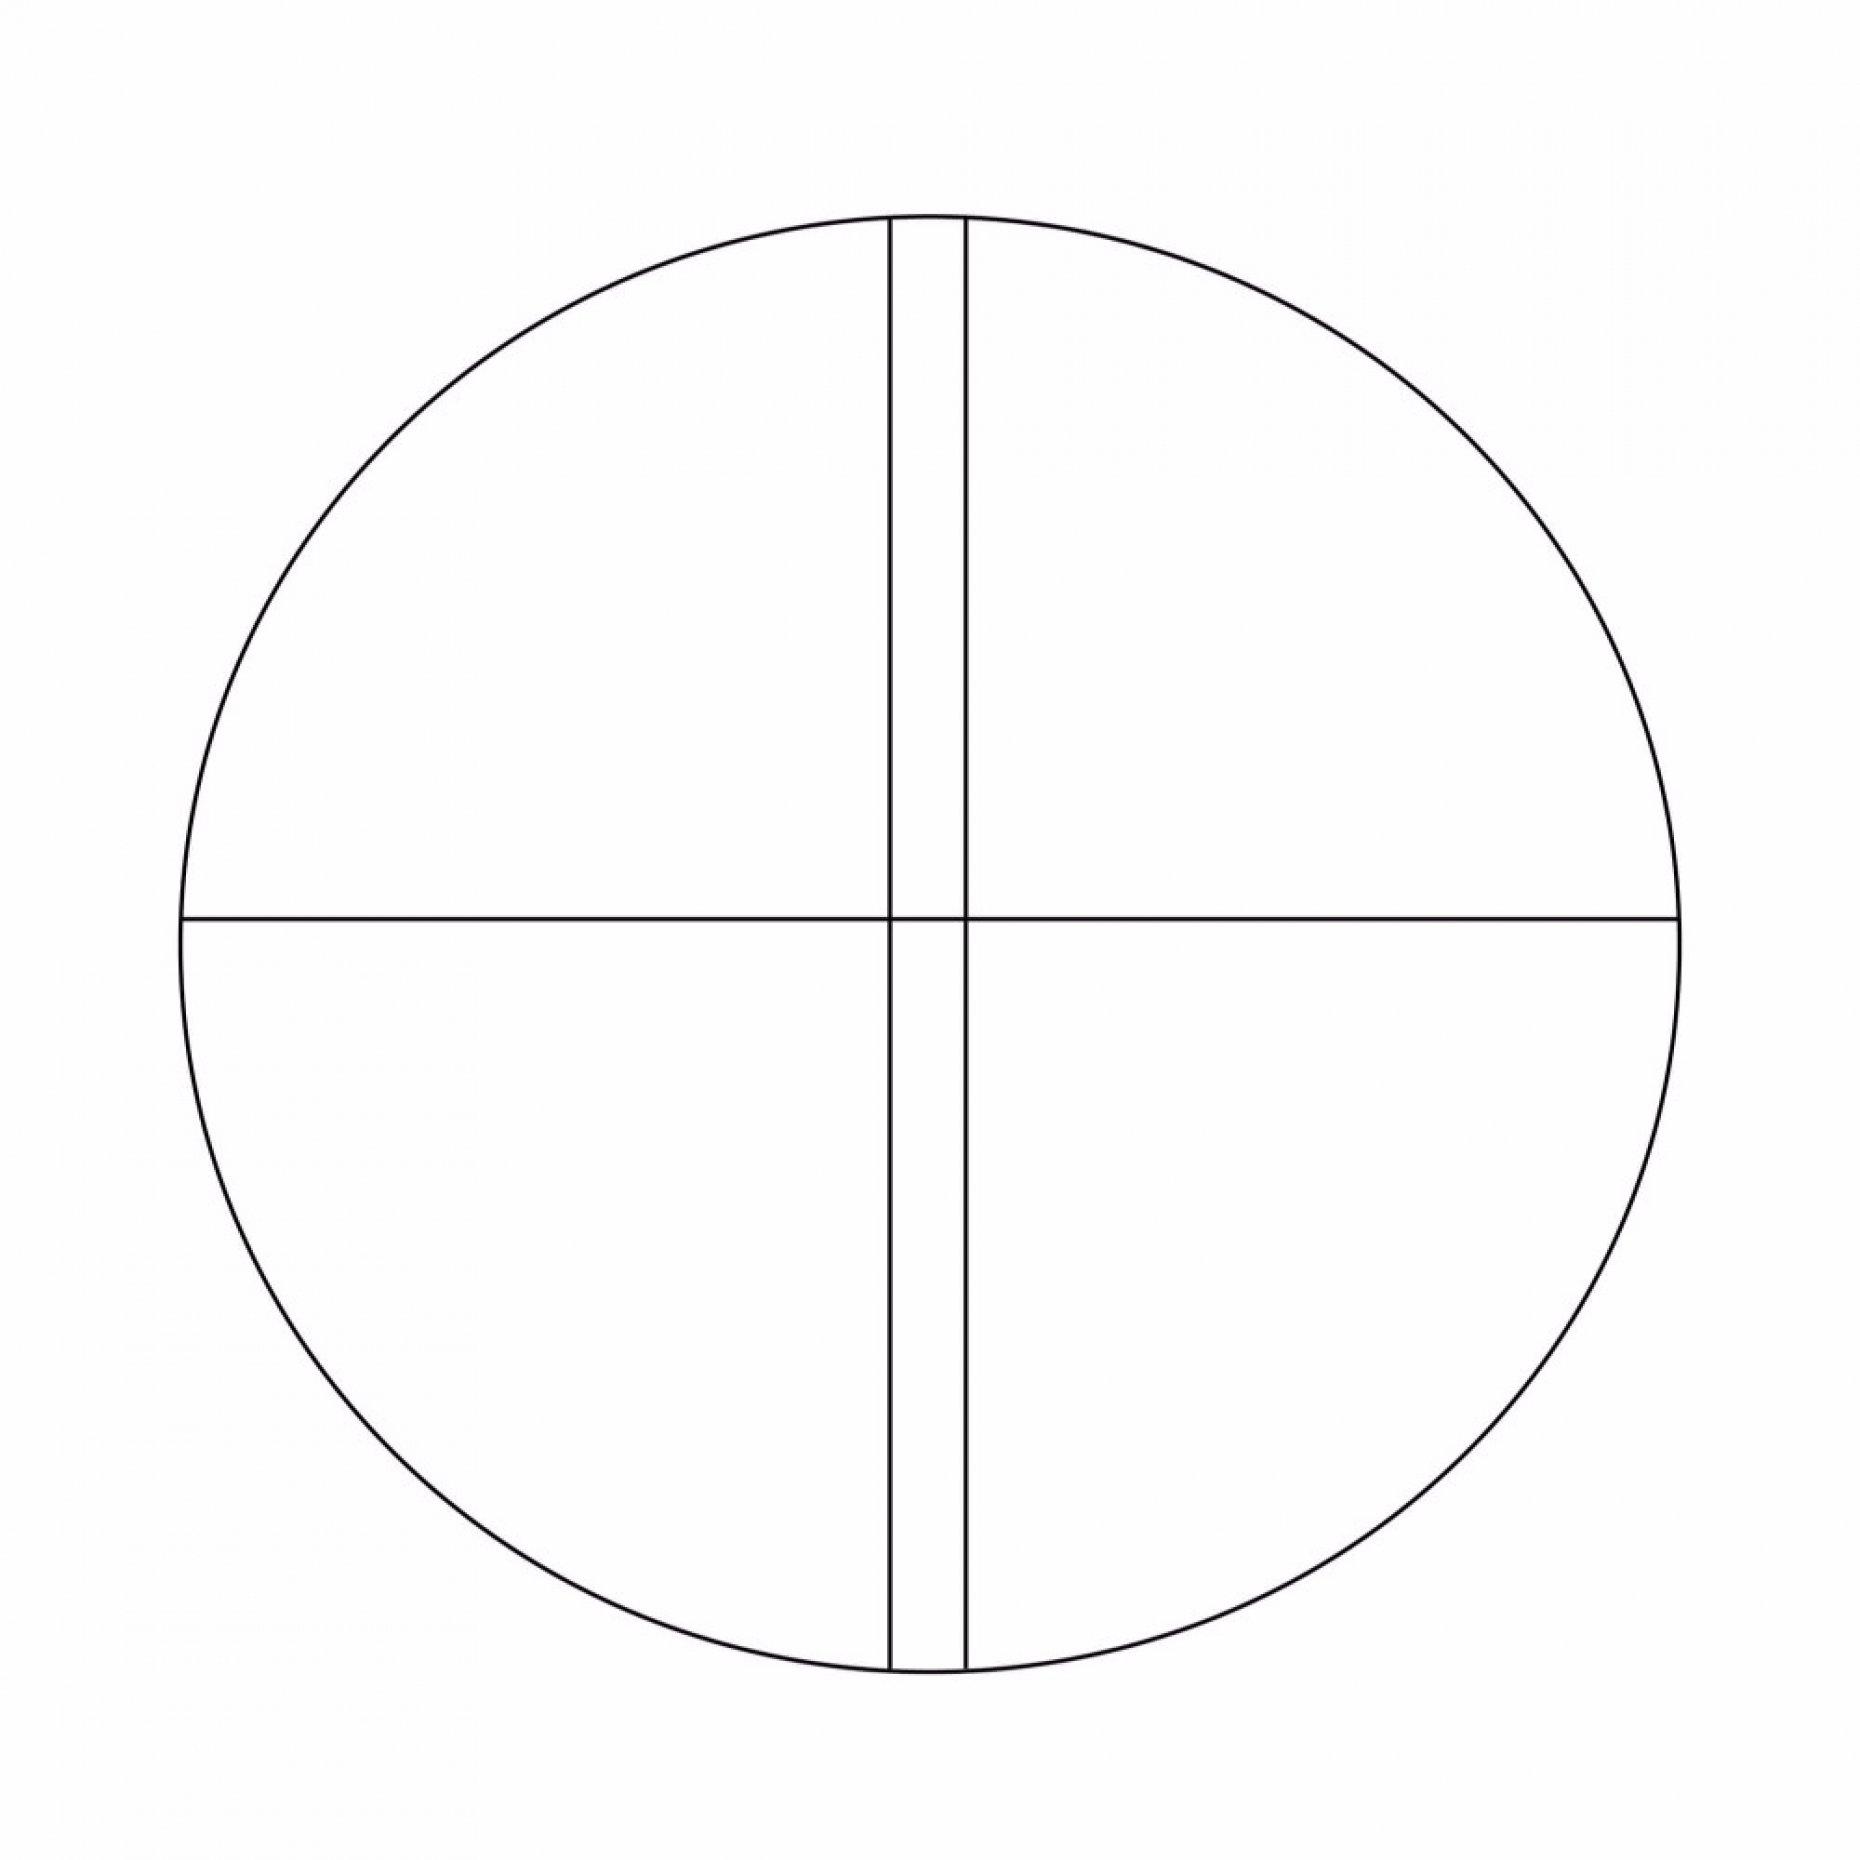 NE54 Vertical Gauge Lines 0.2mm apart + Horizontal Line Pattern